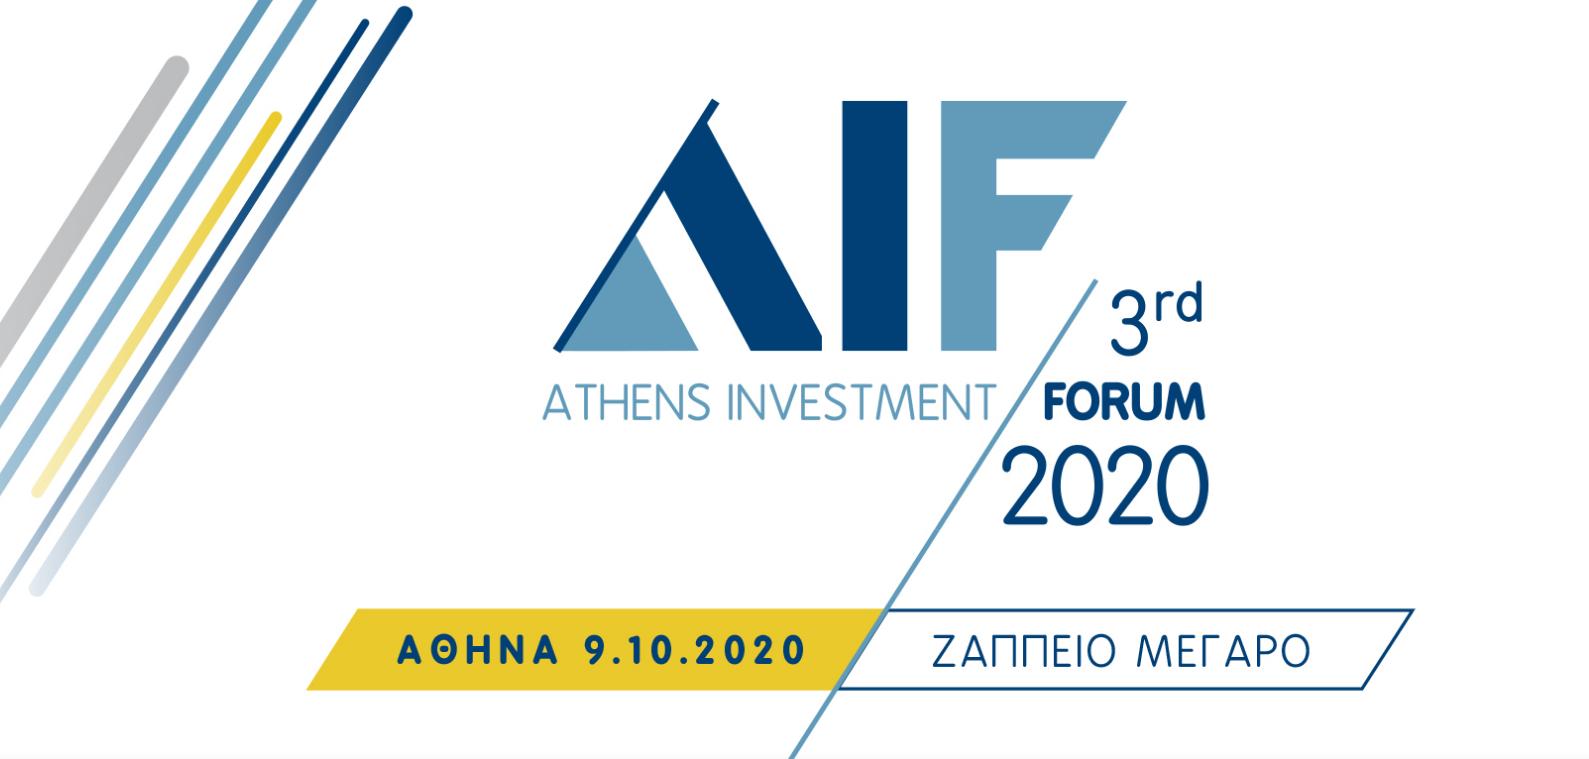 A' ενότητα Athens Investment Forum: «Χρηματοδοτώντας την ισχυρή και βιώσιμη ανάπτυξη»